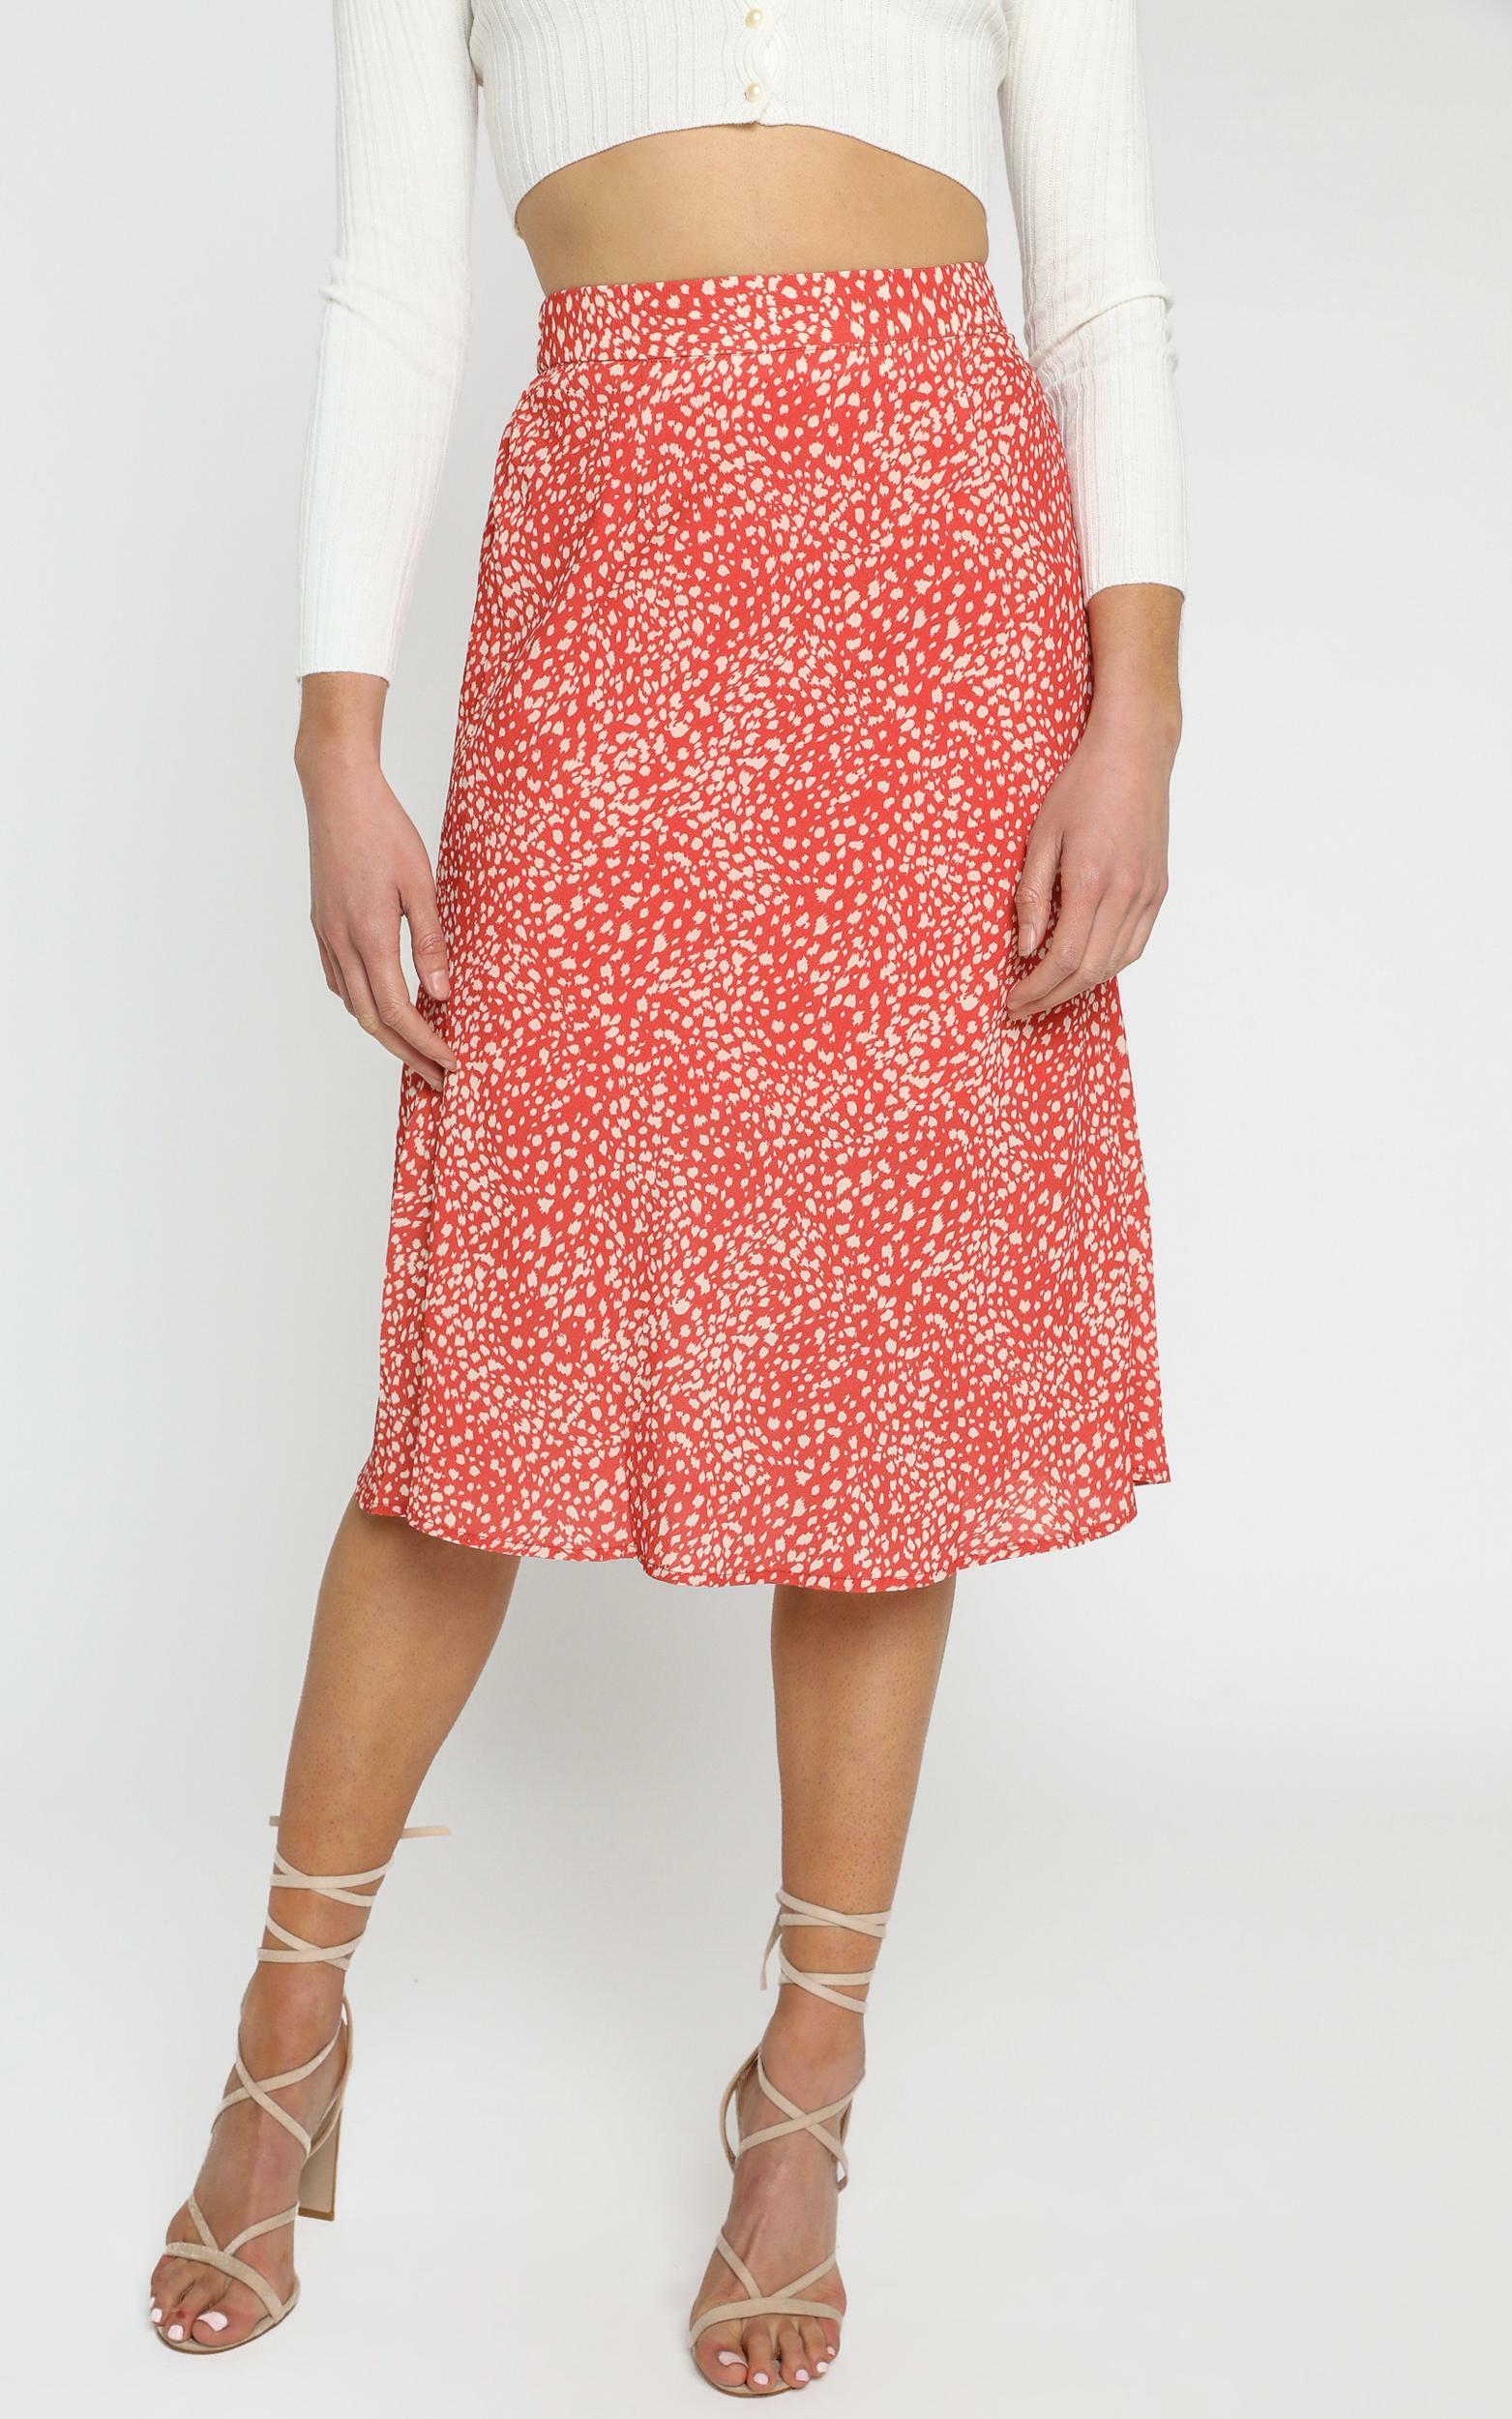 Alegra Skirt in Orange - 6 (XS), Orange, hi-res image number null